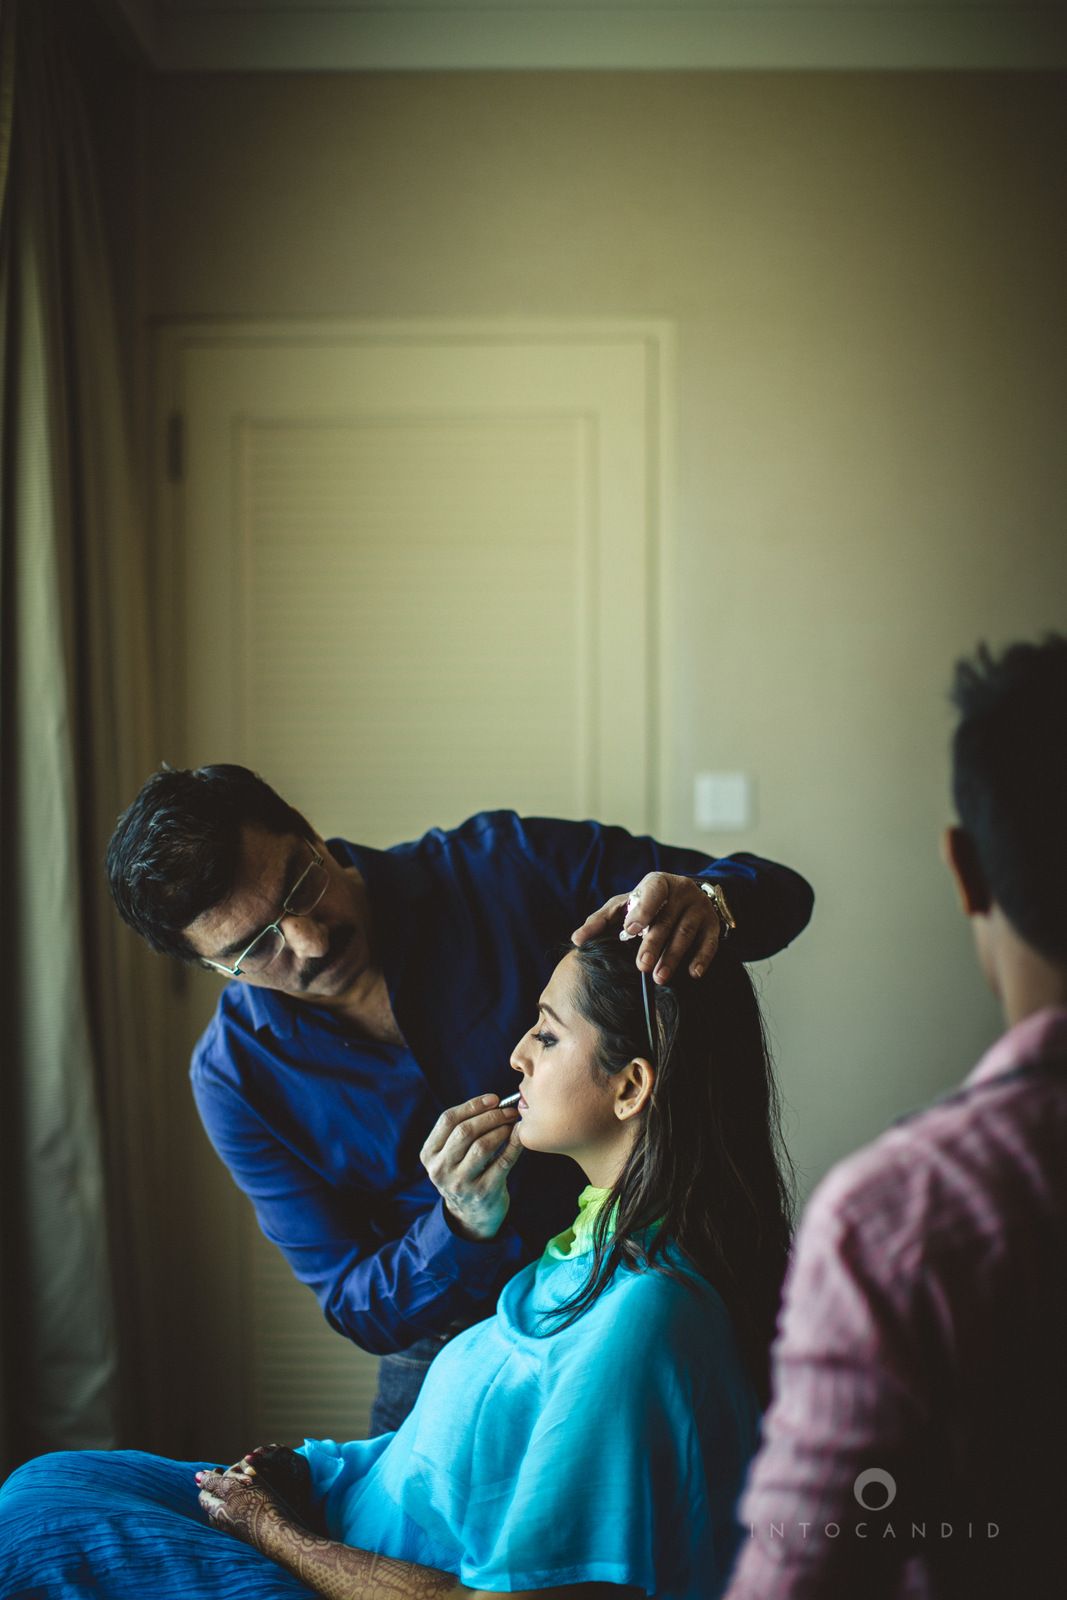 renaissance-powai-wedding-mumbai-intocandid-photography-03.jpg